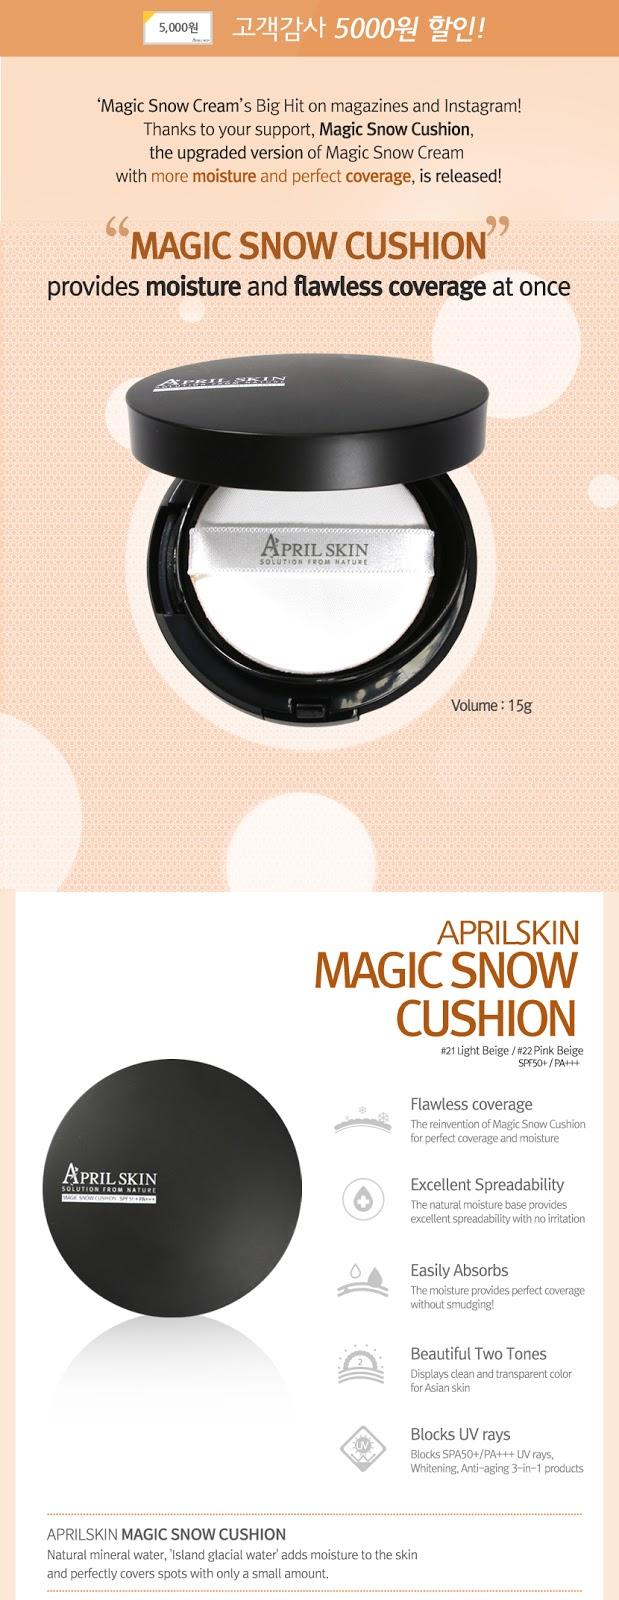 Review April Skin Magic Snow Cushion Spf 50 Pa Celine Han Makeup Apieu Air Fit Spf50pa 23 Natural Beige Set Free Refill